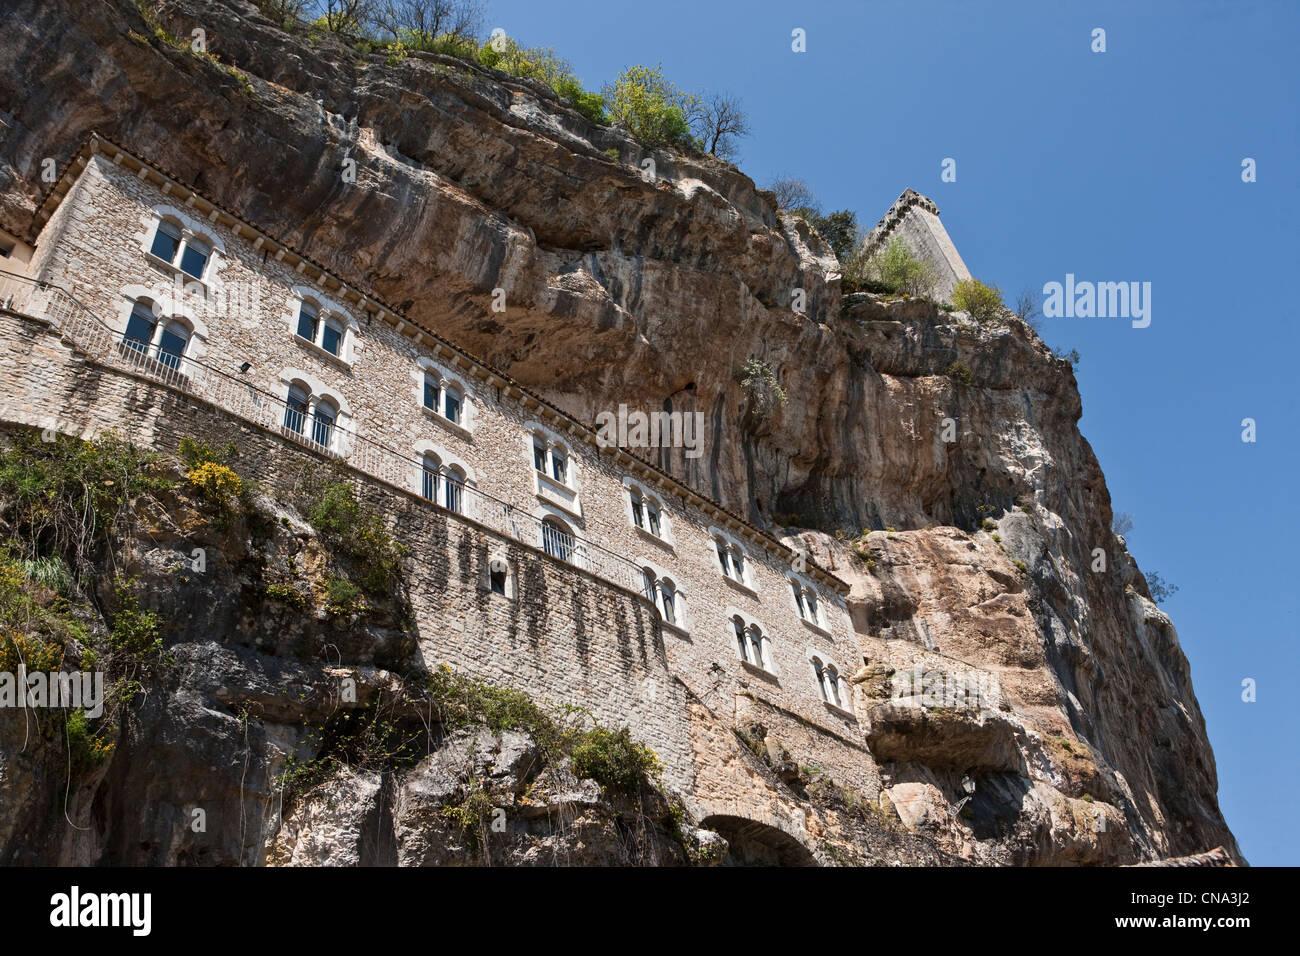 Francia, Lot, Rocamadour, ex Ospitalità Immagini Stock